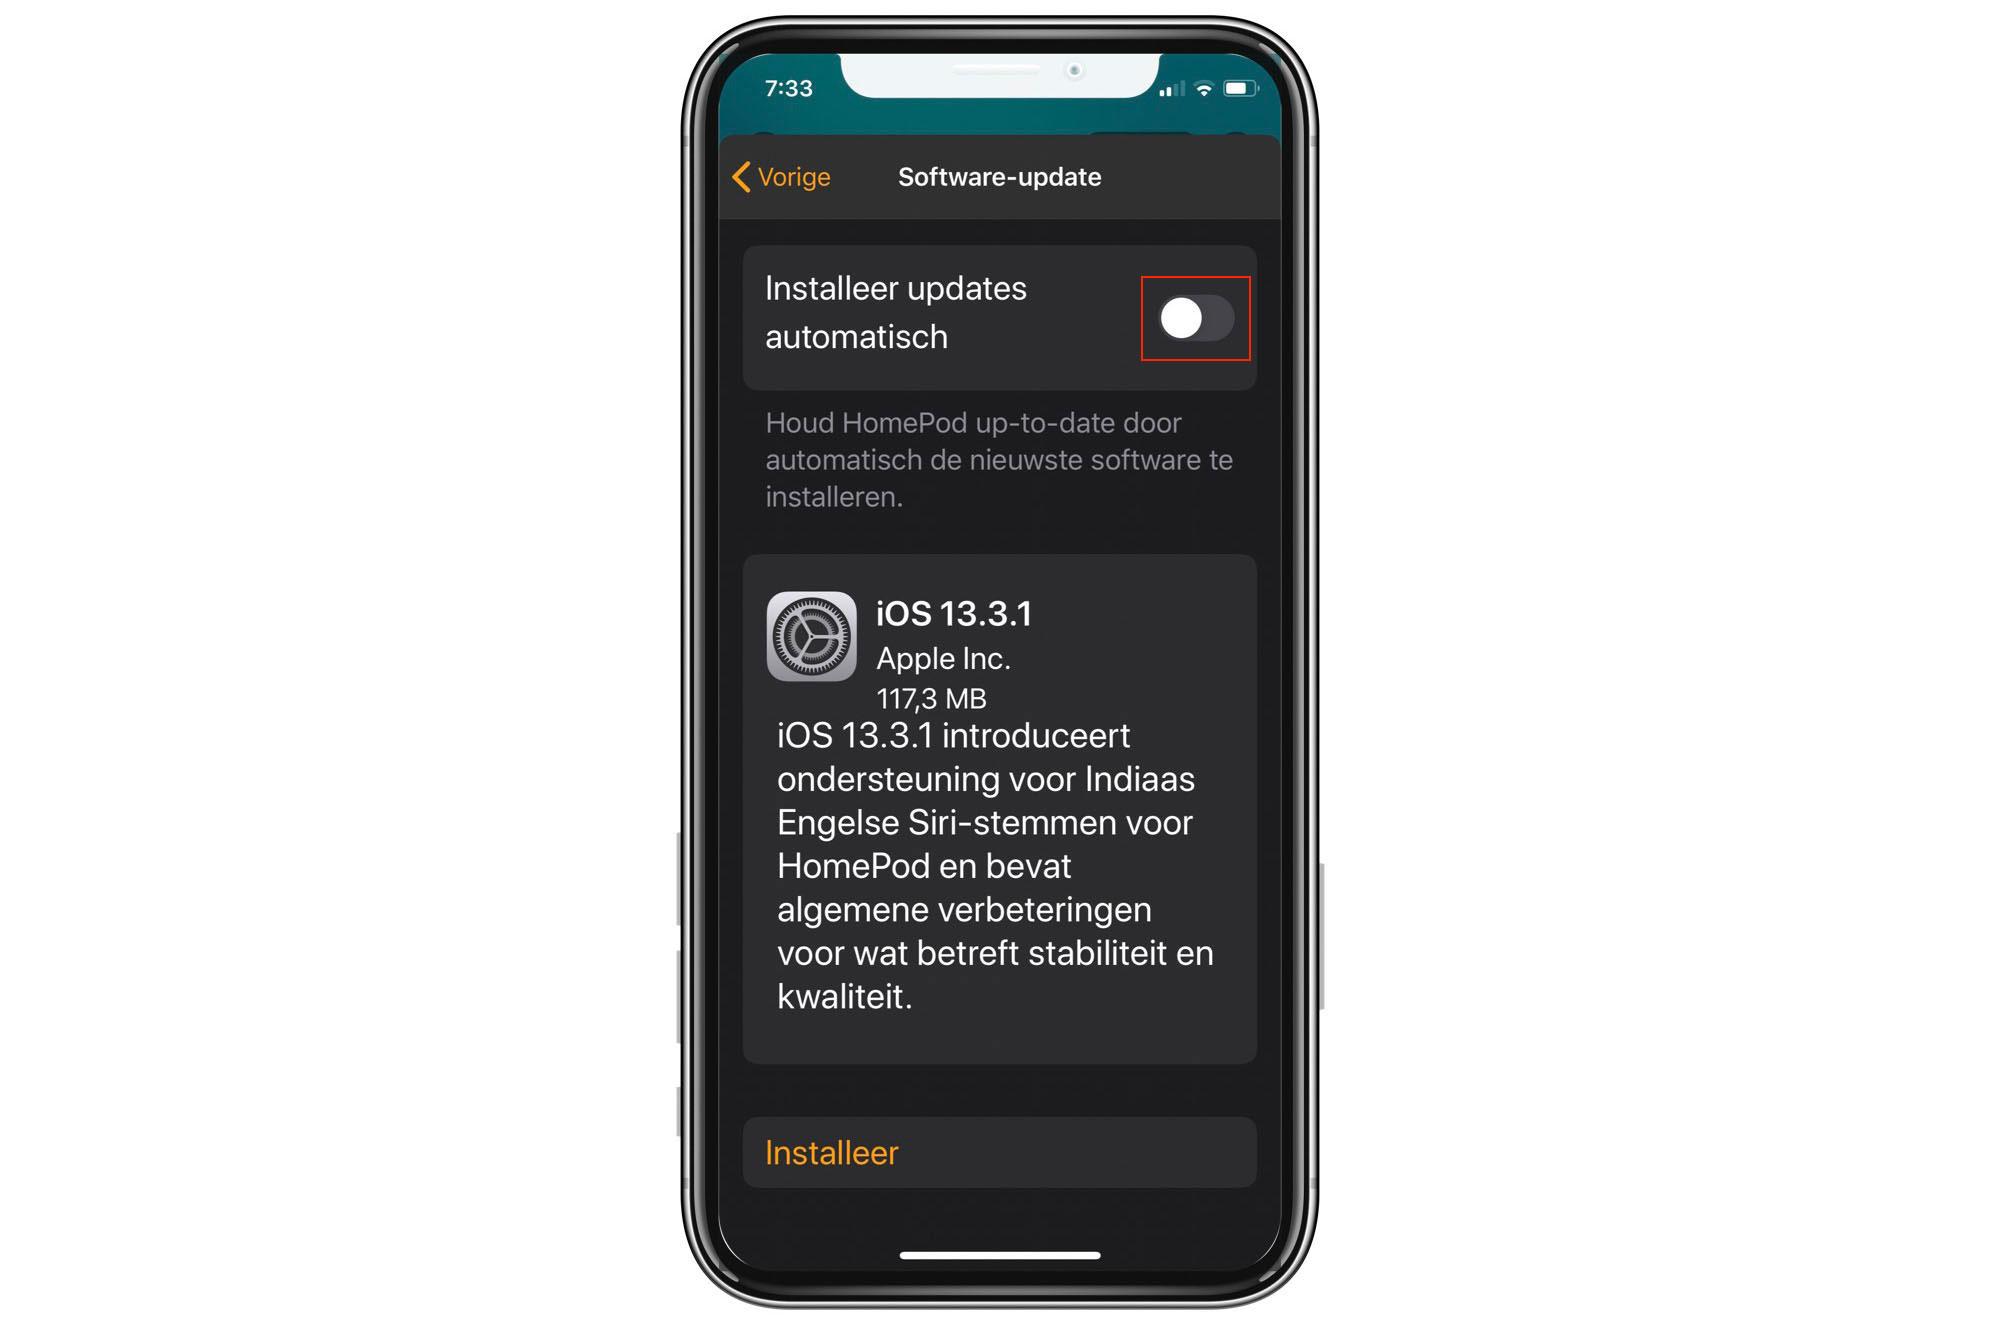 https://www.macfreak.nl/modules/news/images/zArt.iOS13.3.1HomePodReleaseNotes.jpg